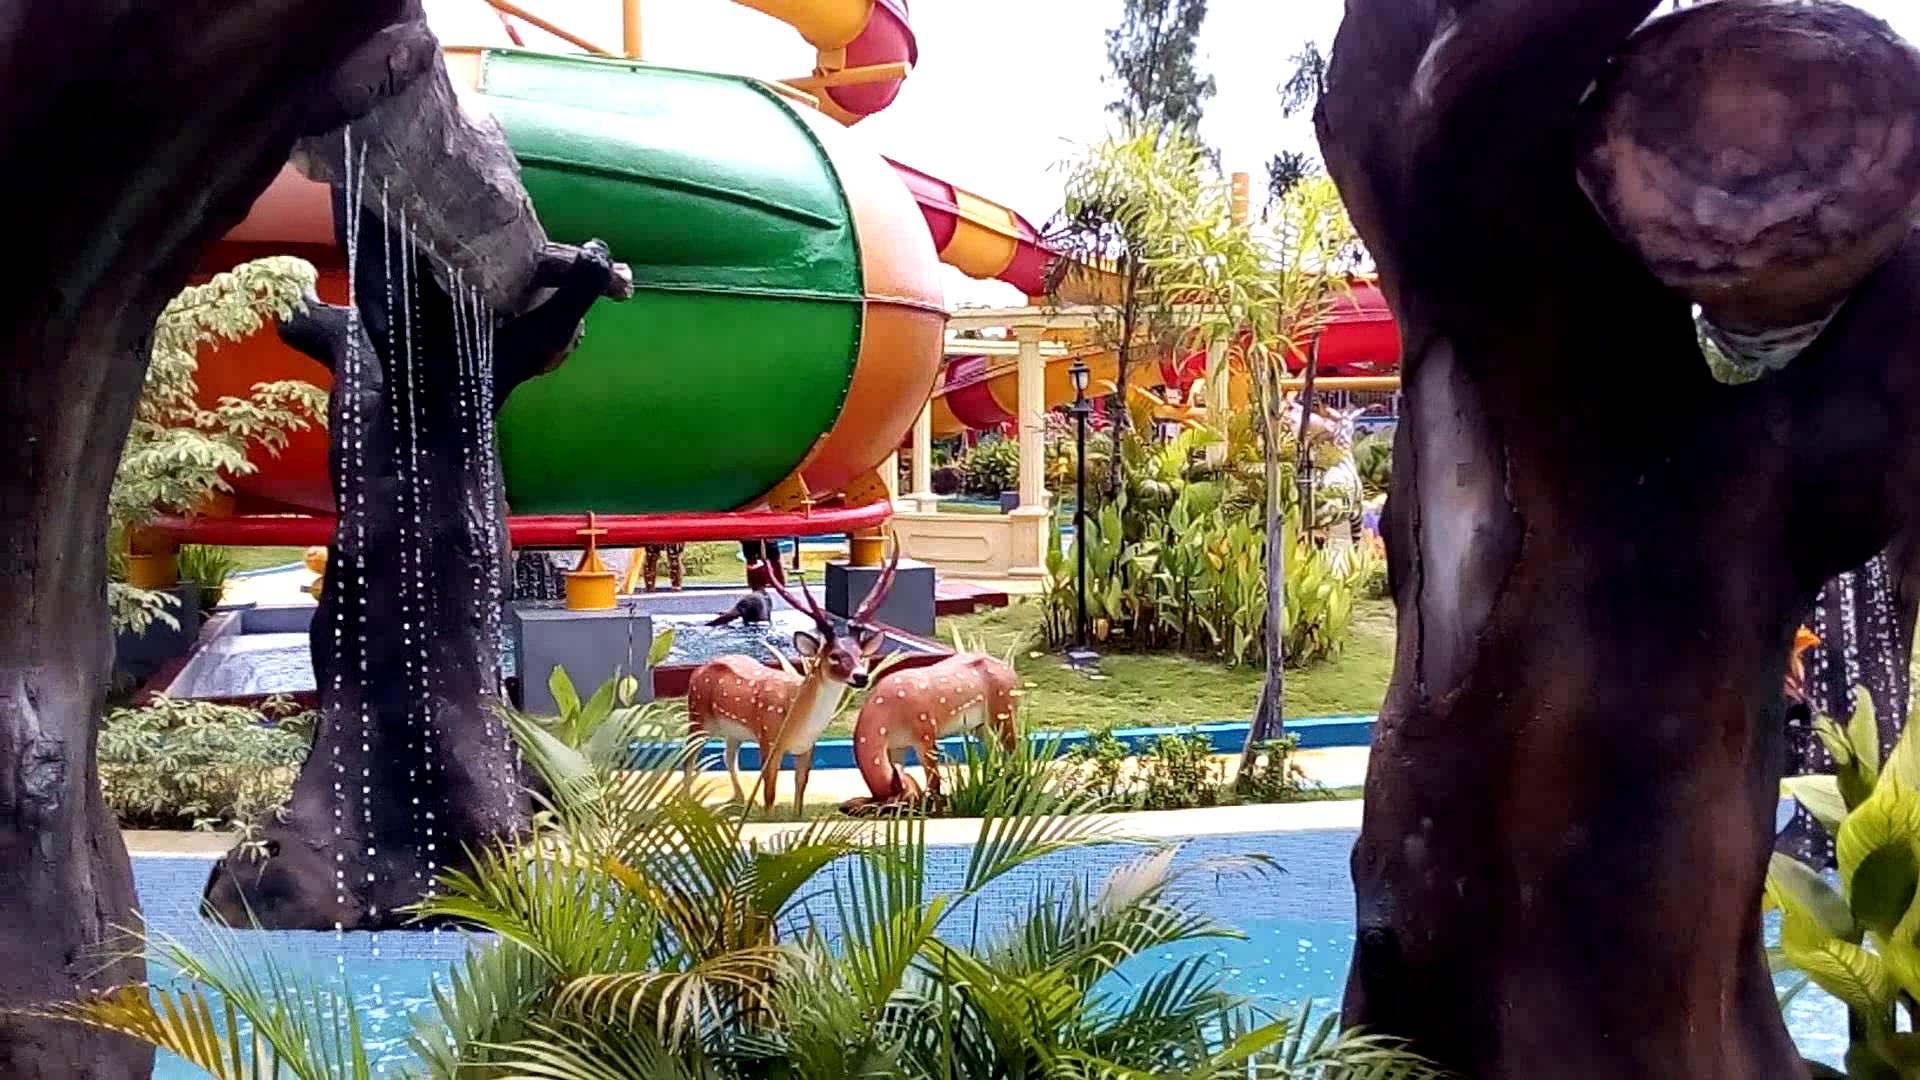 Suasana Water World Dynasti Gkb Gresik Youtube Bukit Awan Waterpark